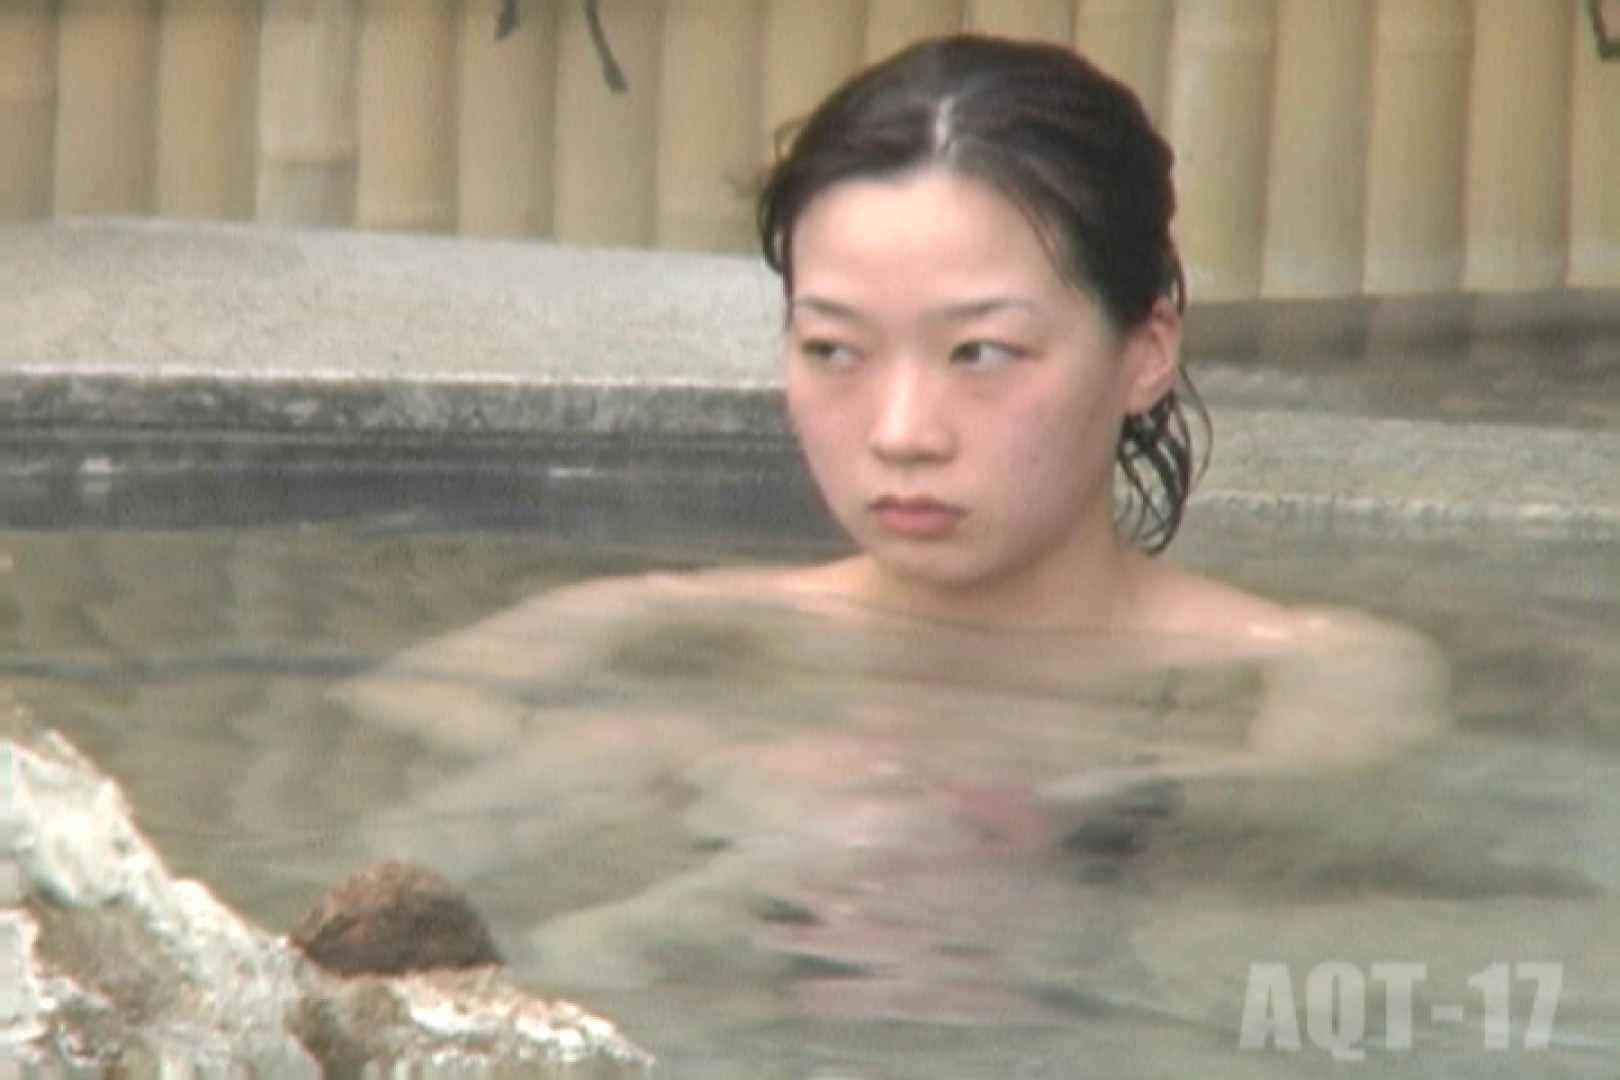 Aquaな露天風呂Vol.848 盗撮特撮  12pic 6